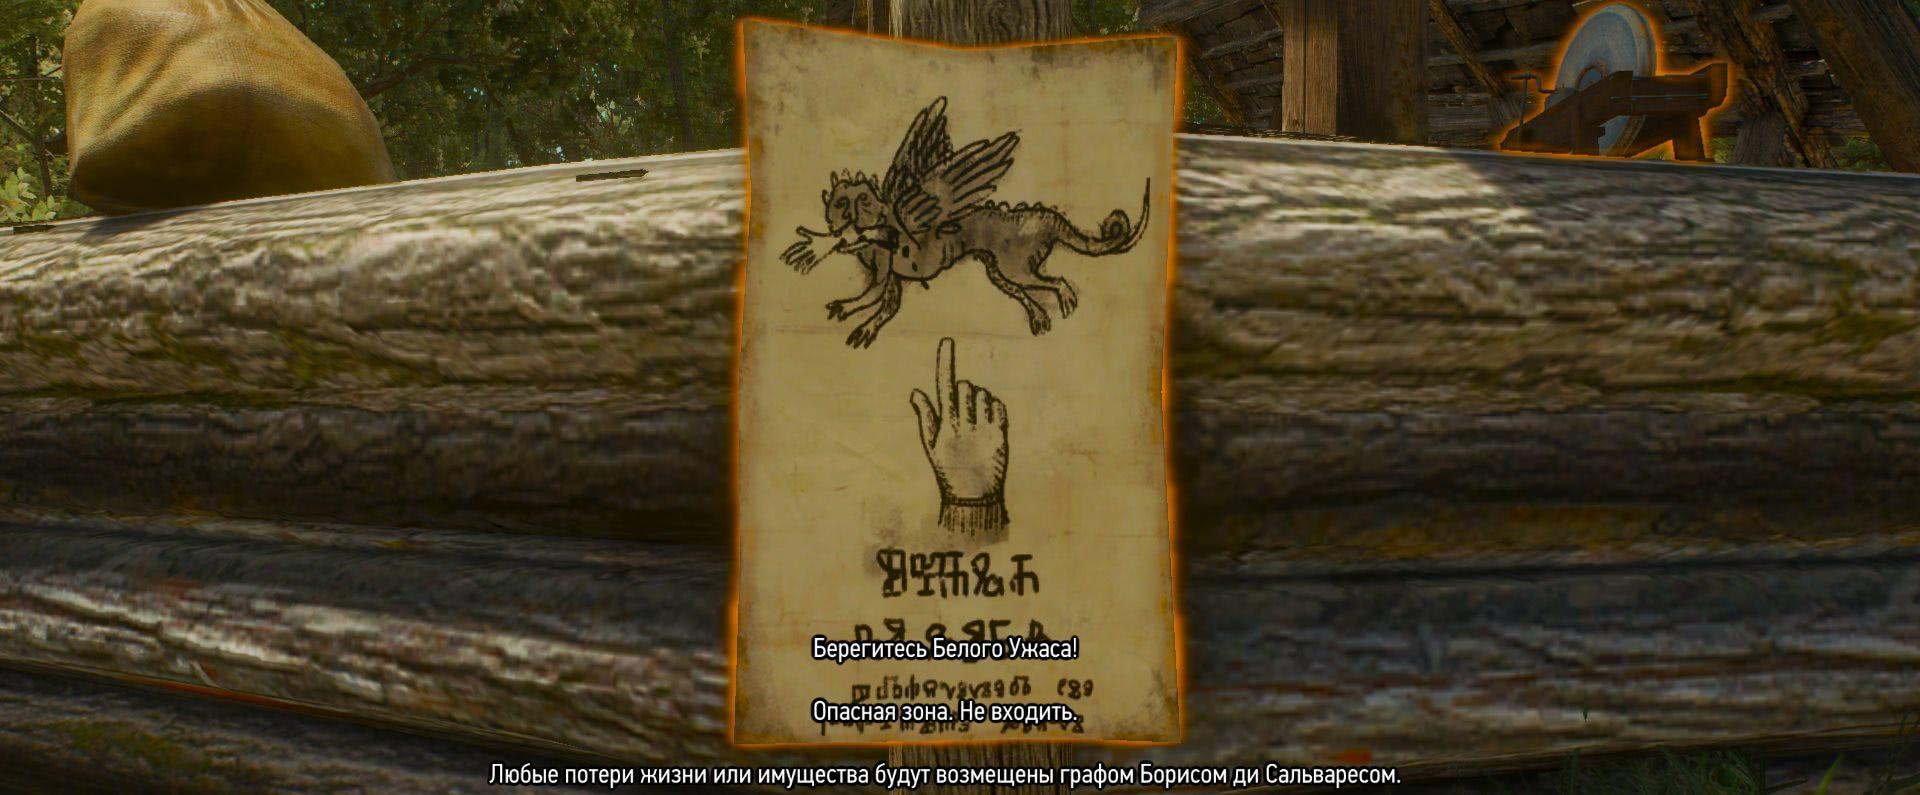 witcher3 Равновесие в природе2